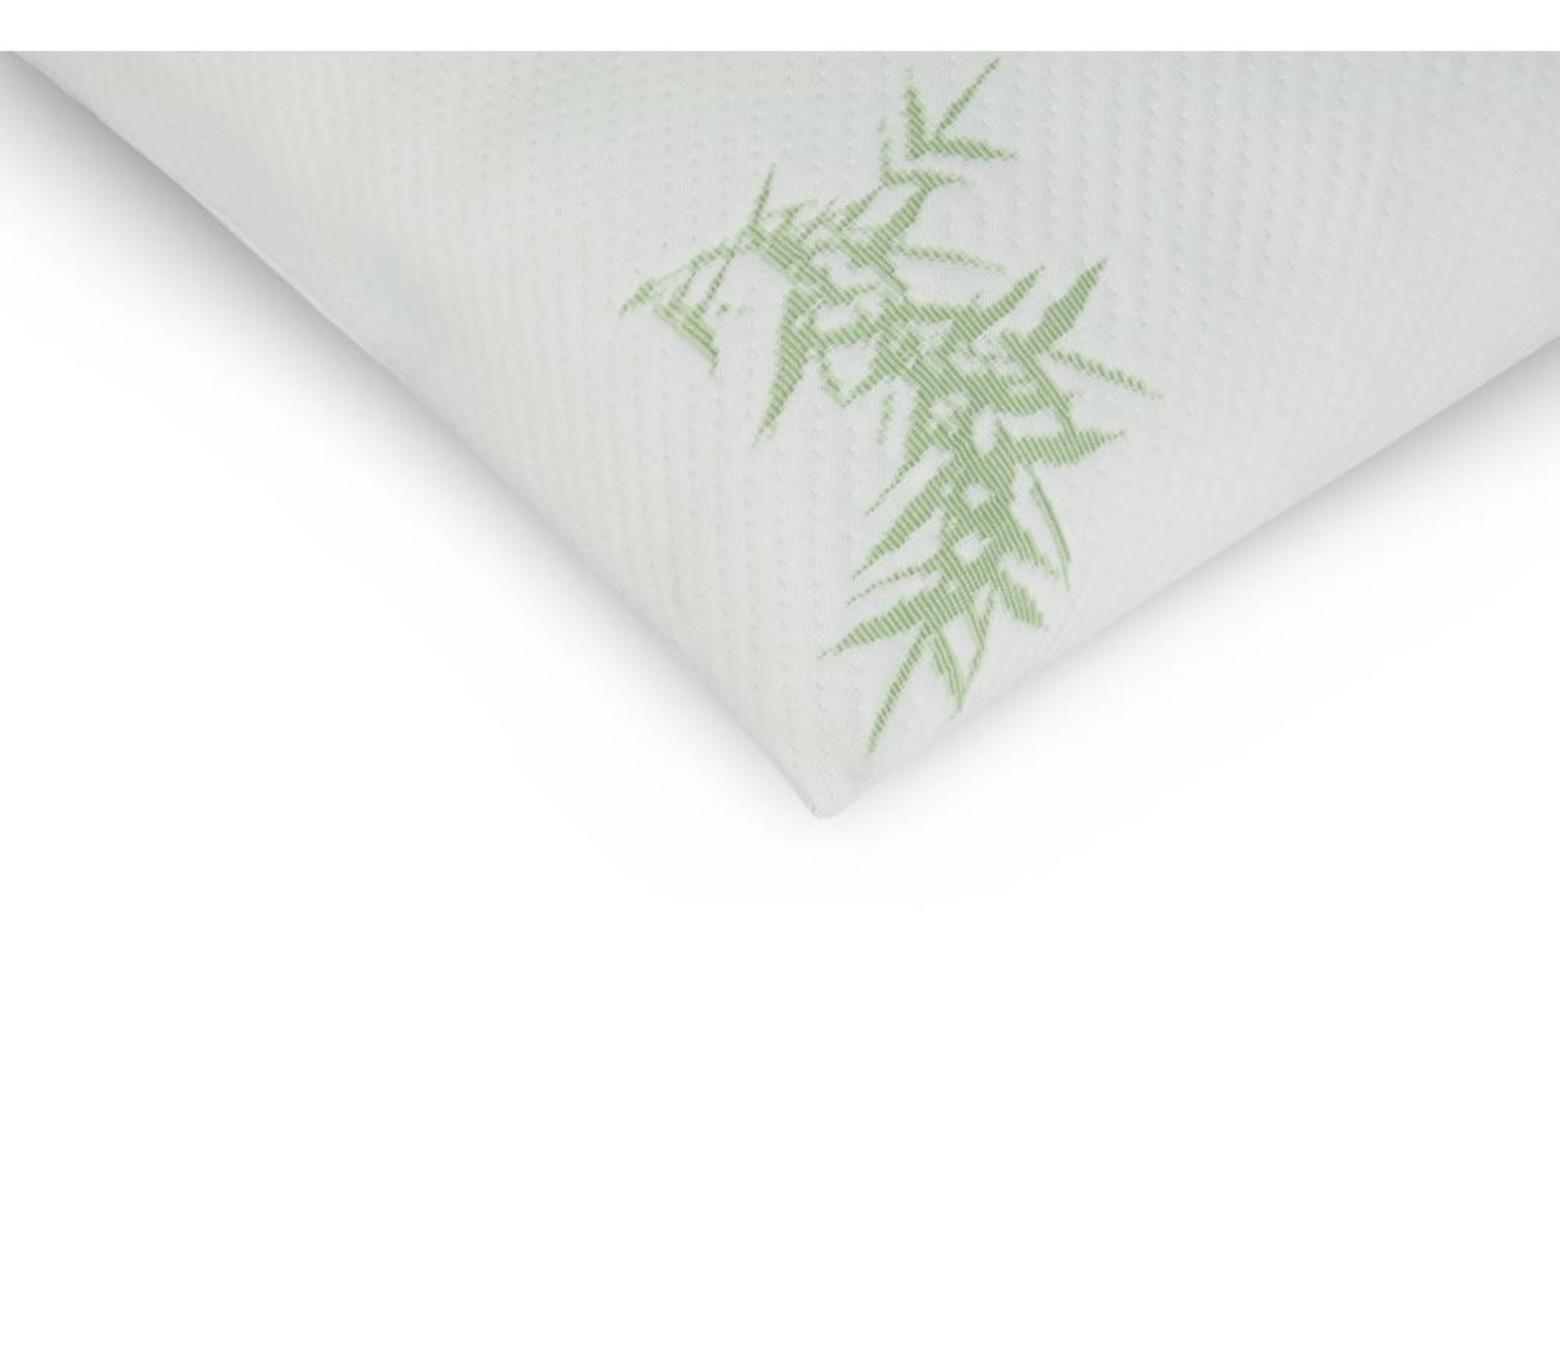 2 stuks Bamboo memory foam kussens